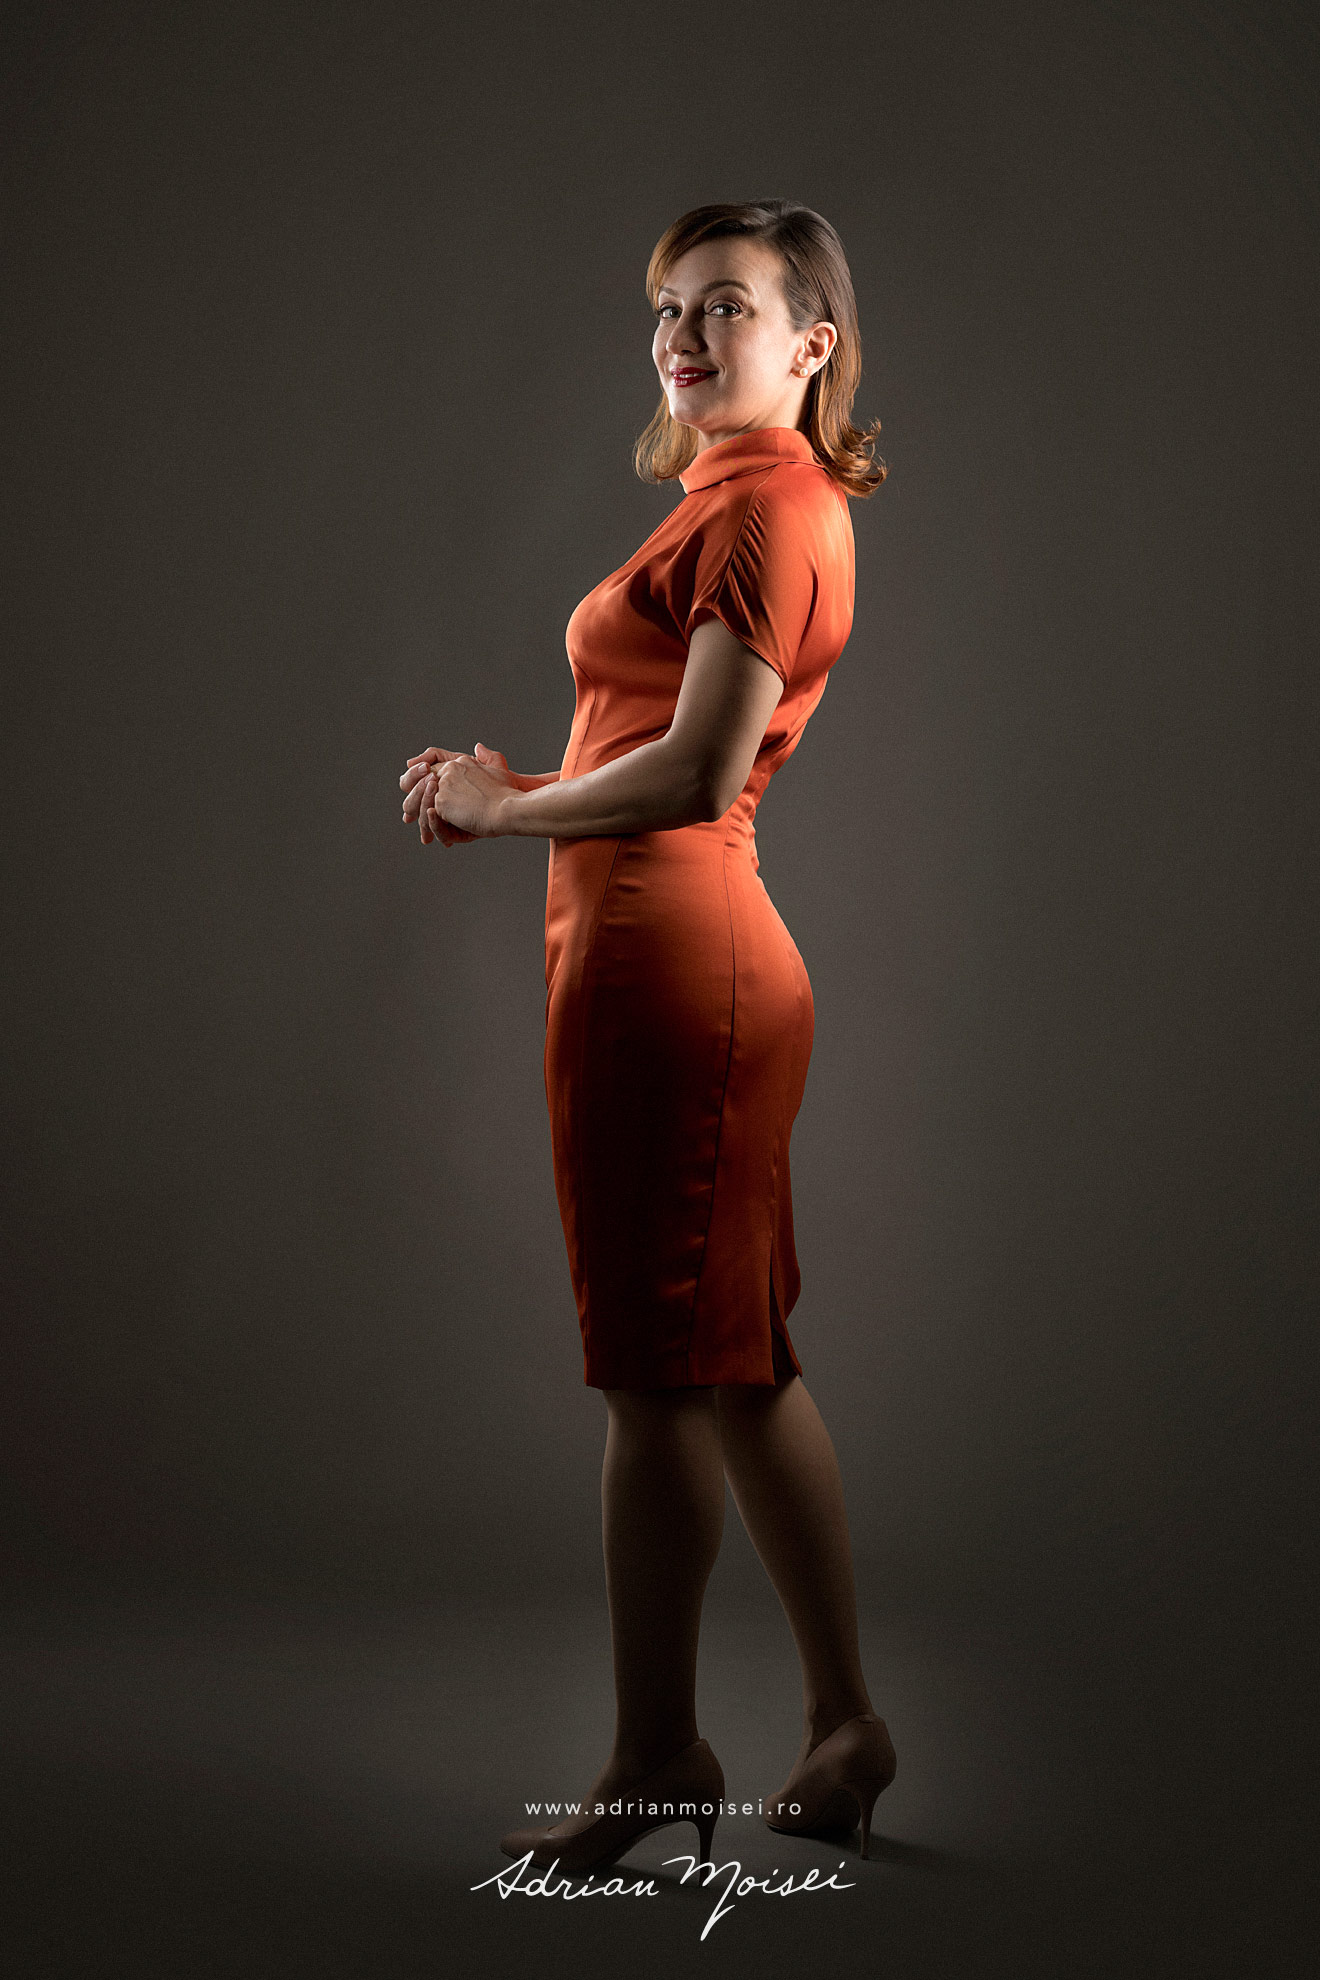 Fotograf studio Iasi, fotografie portret in Iasi, foto Adrian Moisei, Insotitor de bord, flight attendant